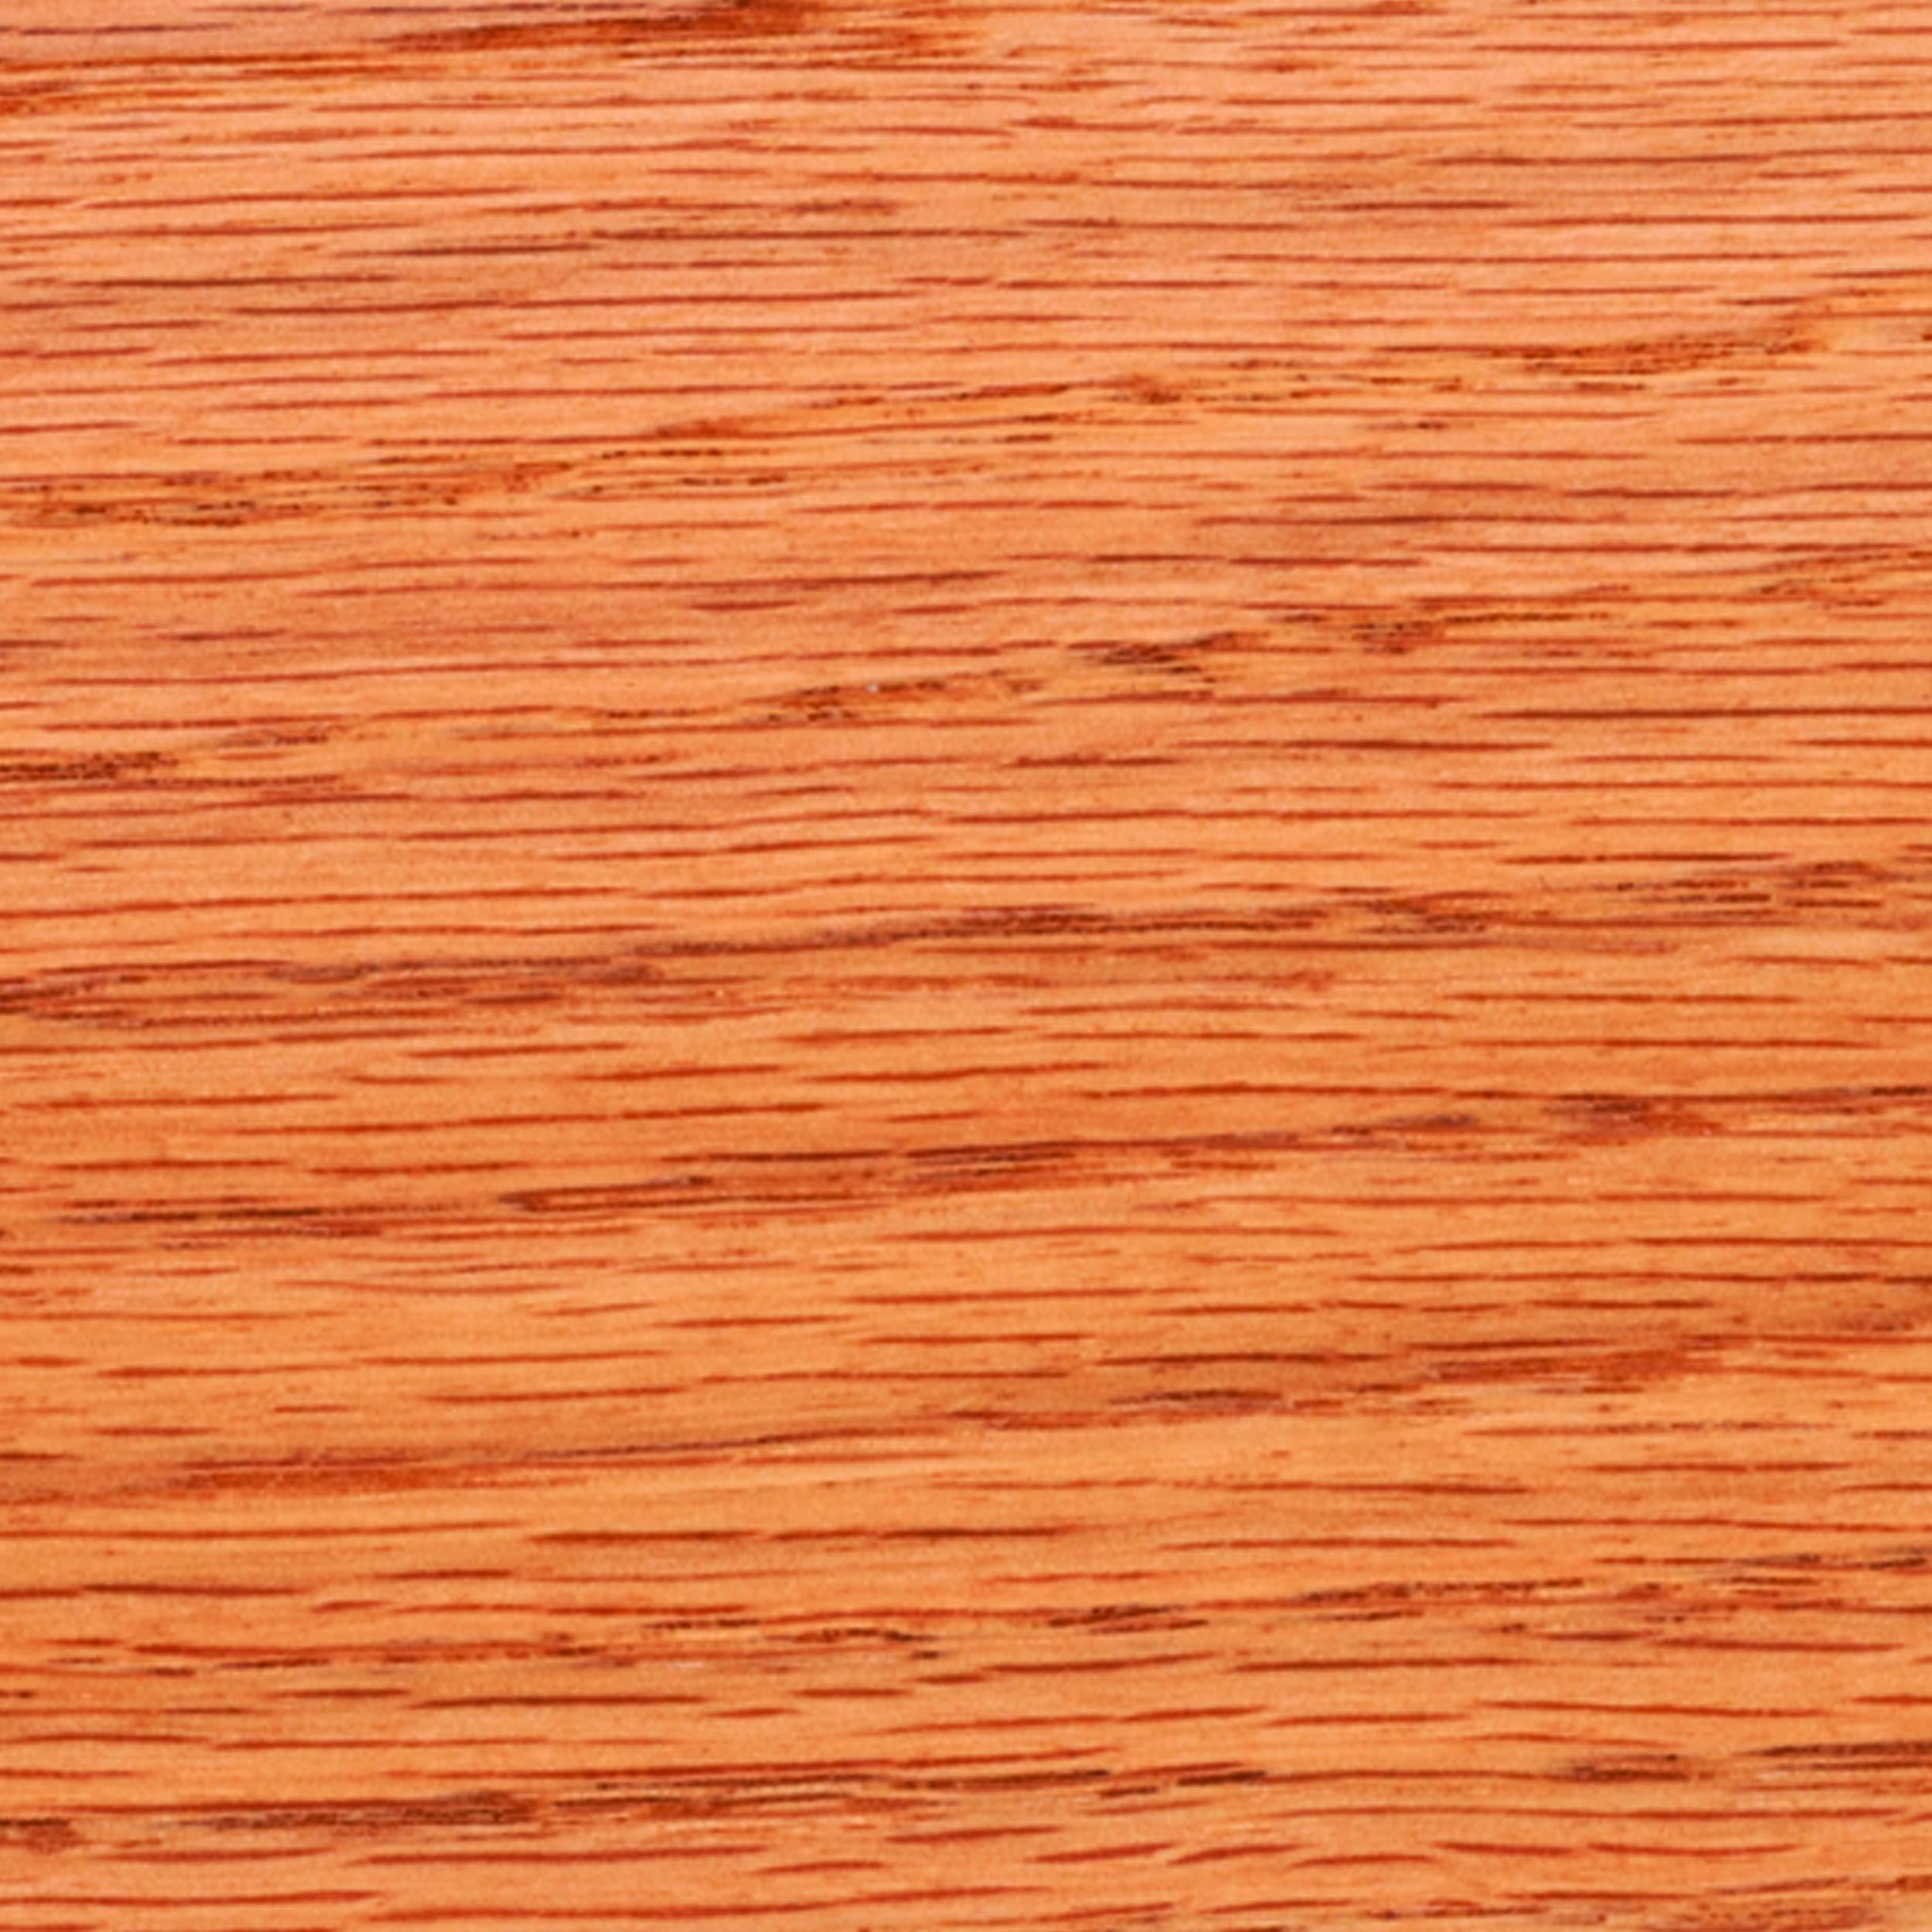 Oak, Red 3'' x 3'' x 36'' by WOODCRAFT